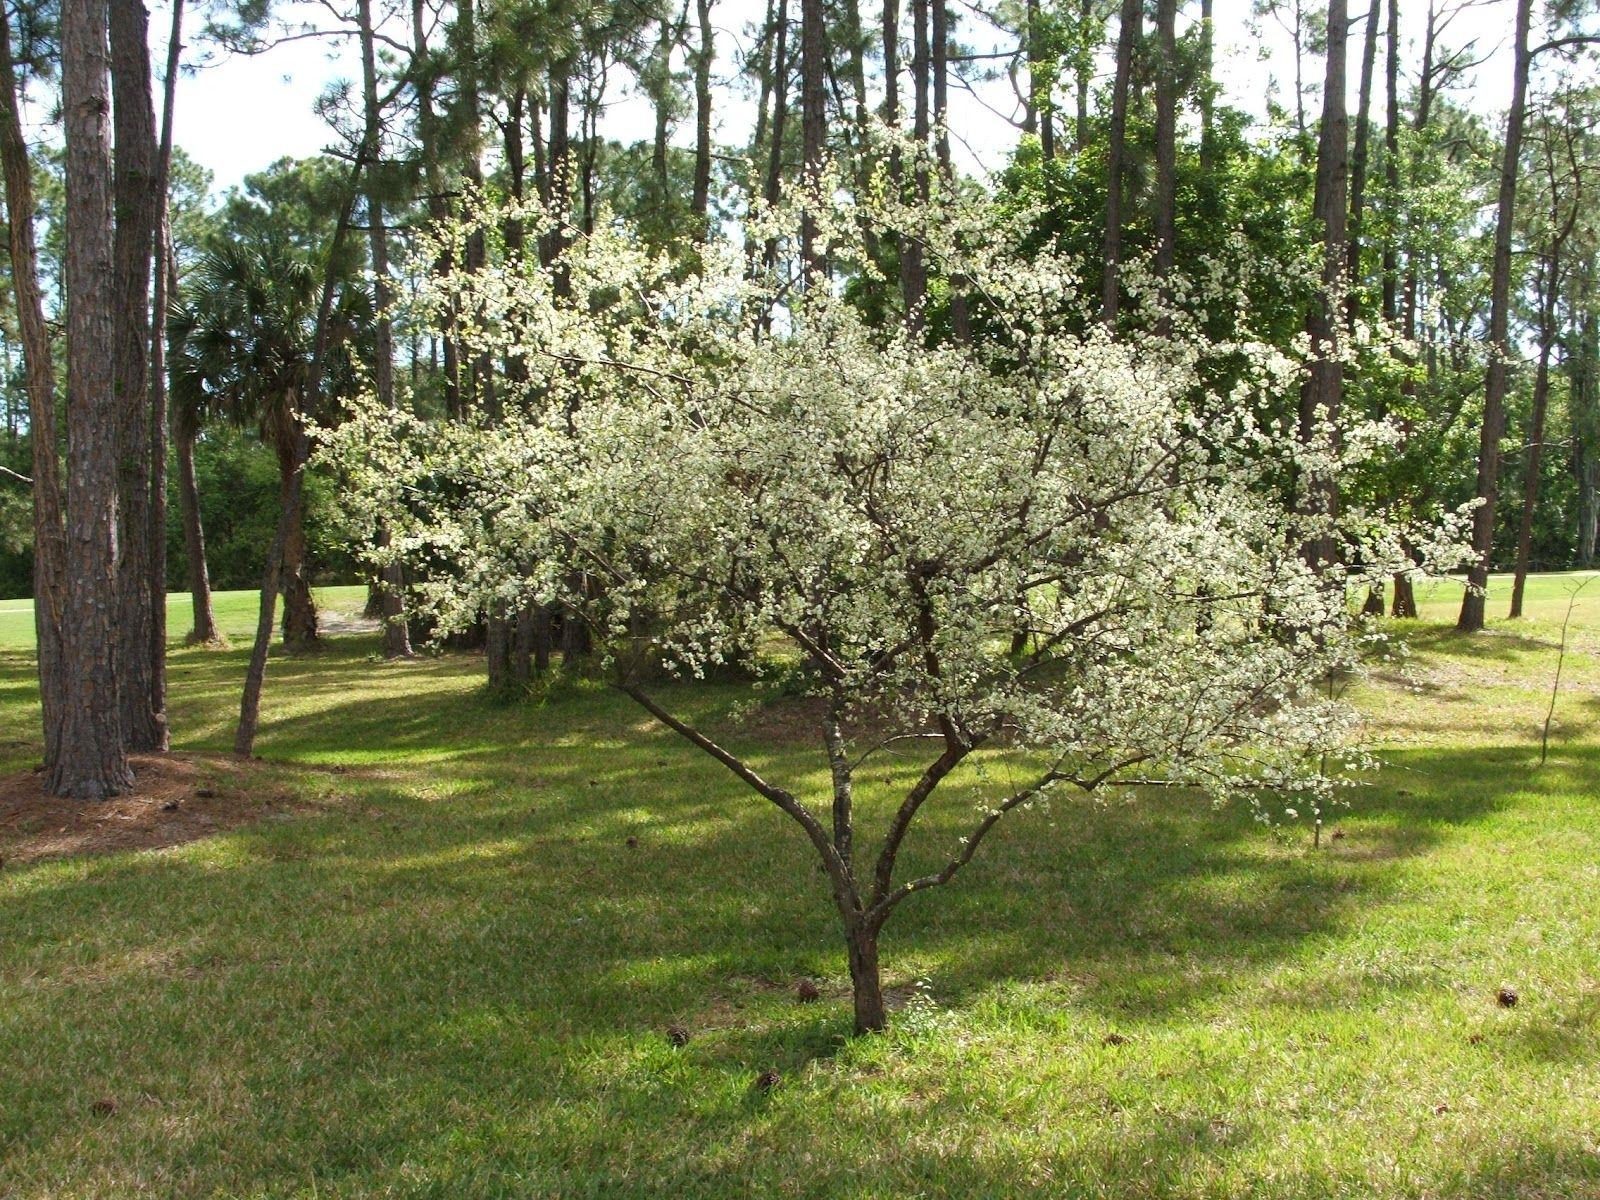 Chickasaw plum prunus angustifolia florida native shrub for Small trees